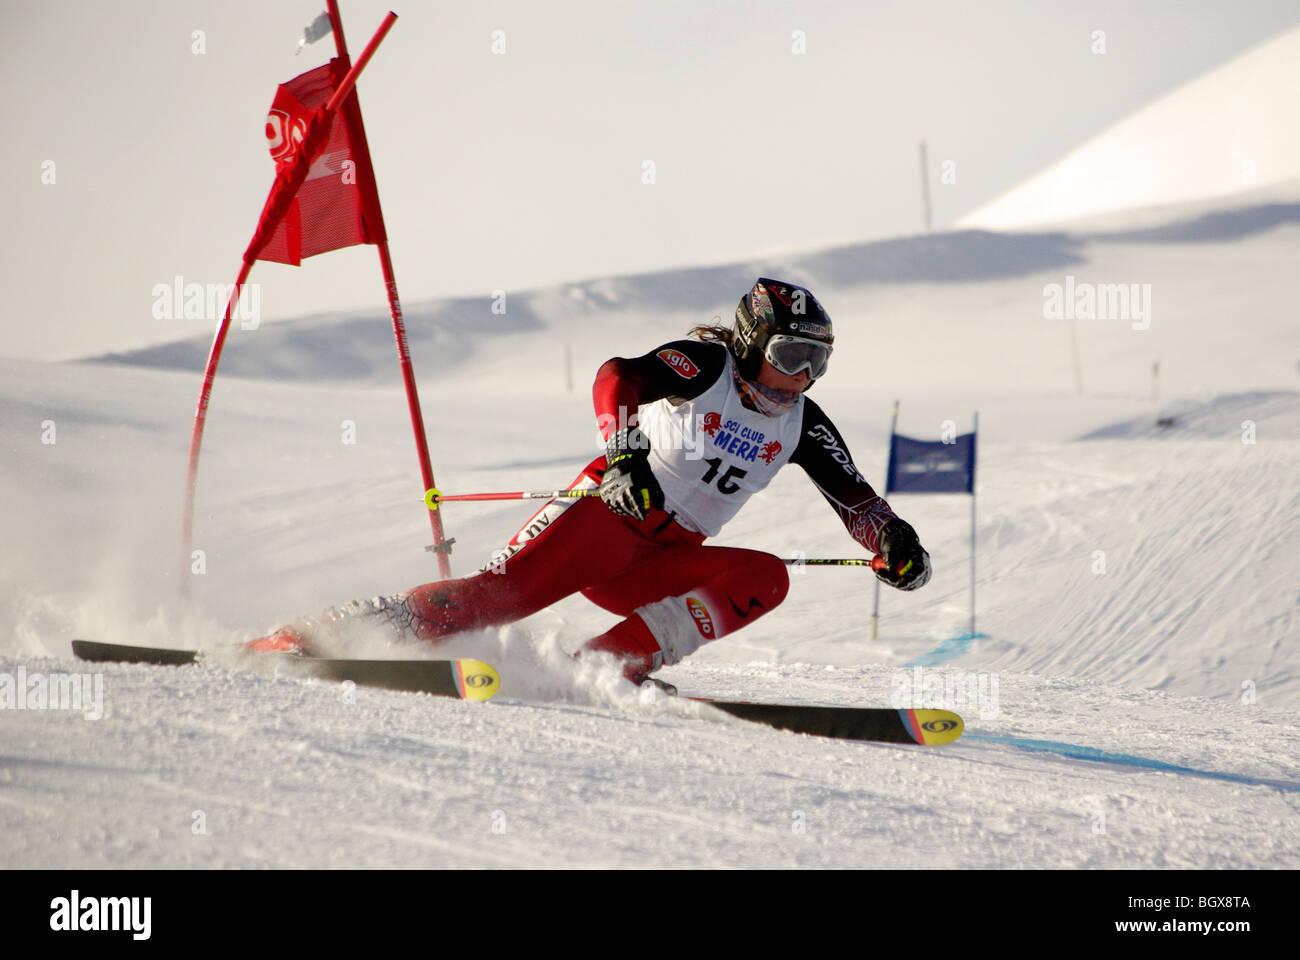 ski race, athlete curve near the pole - Stock Image